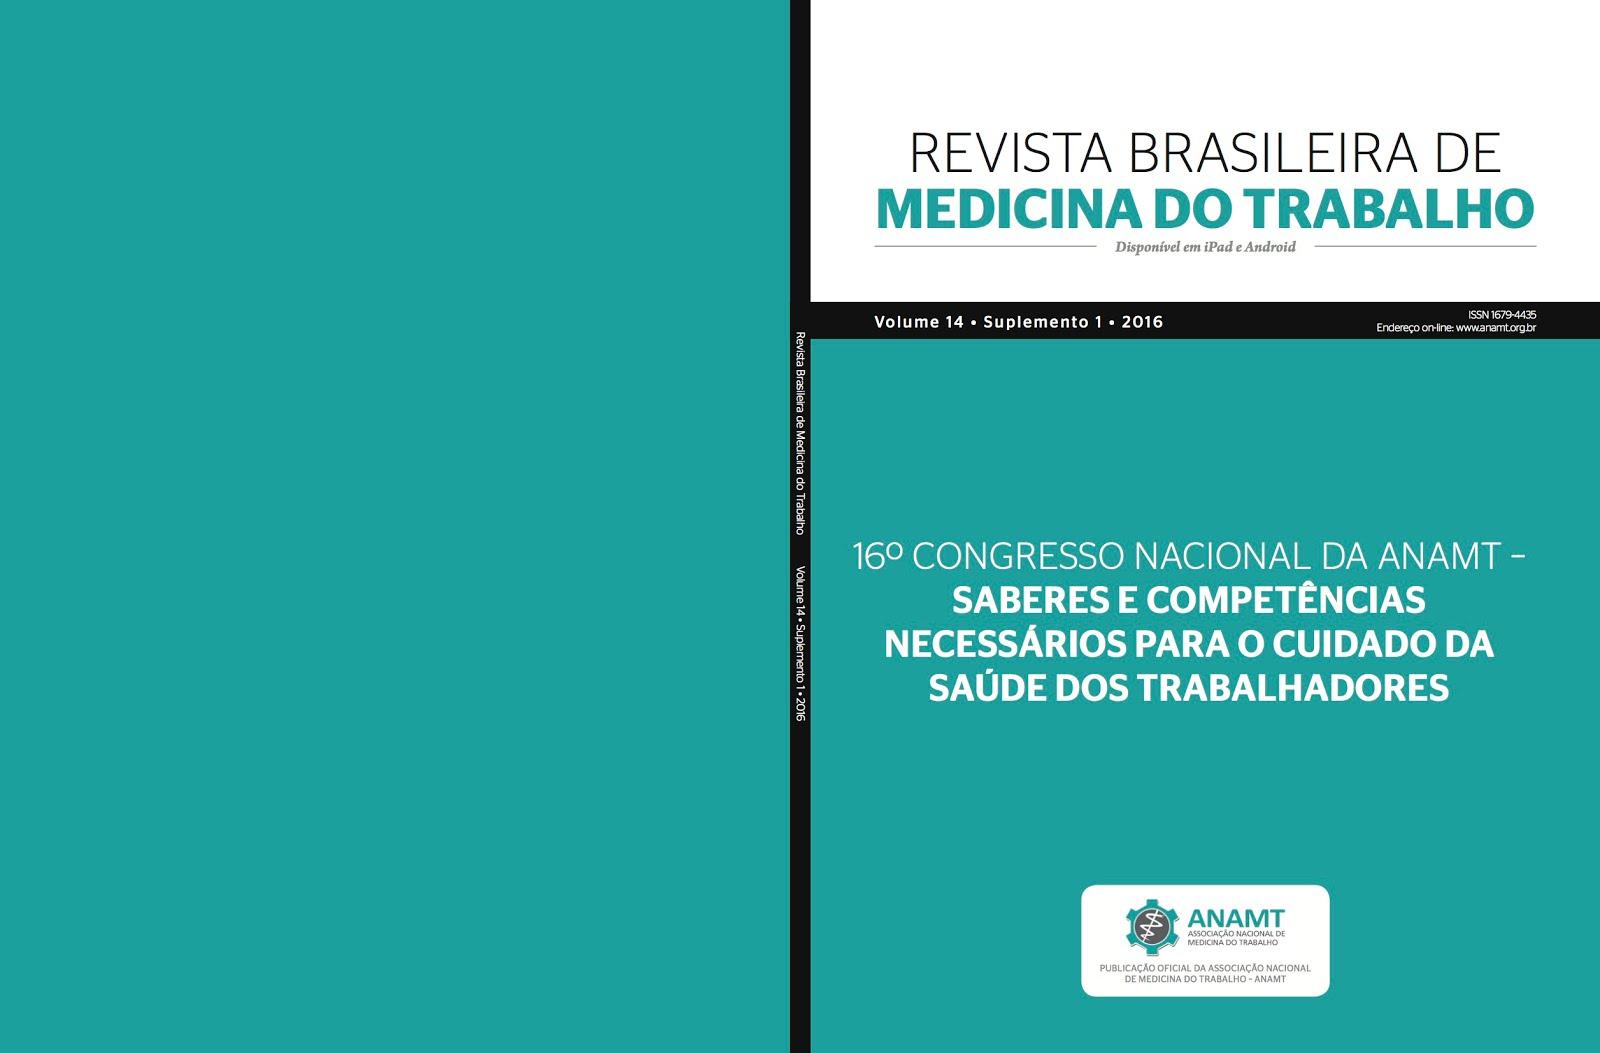 Revista Brasileira de Medicina do Trabalho Volume 14 Suplemento 1